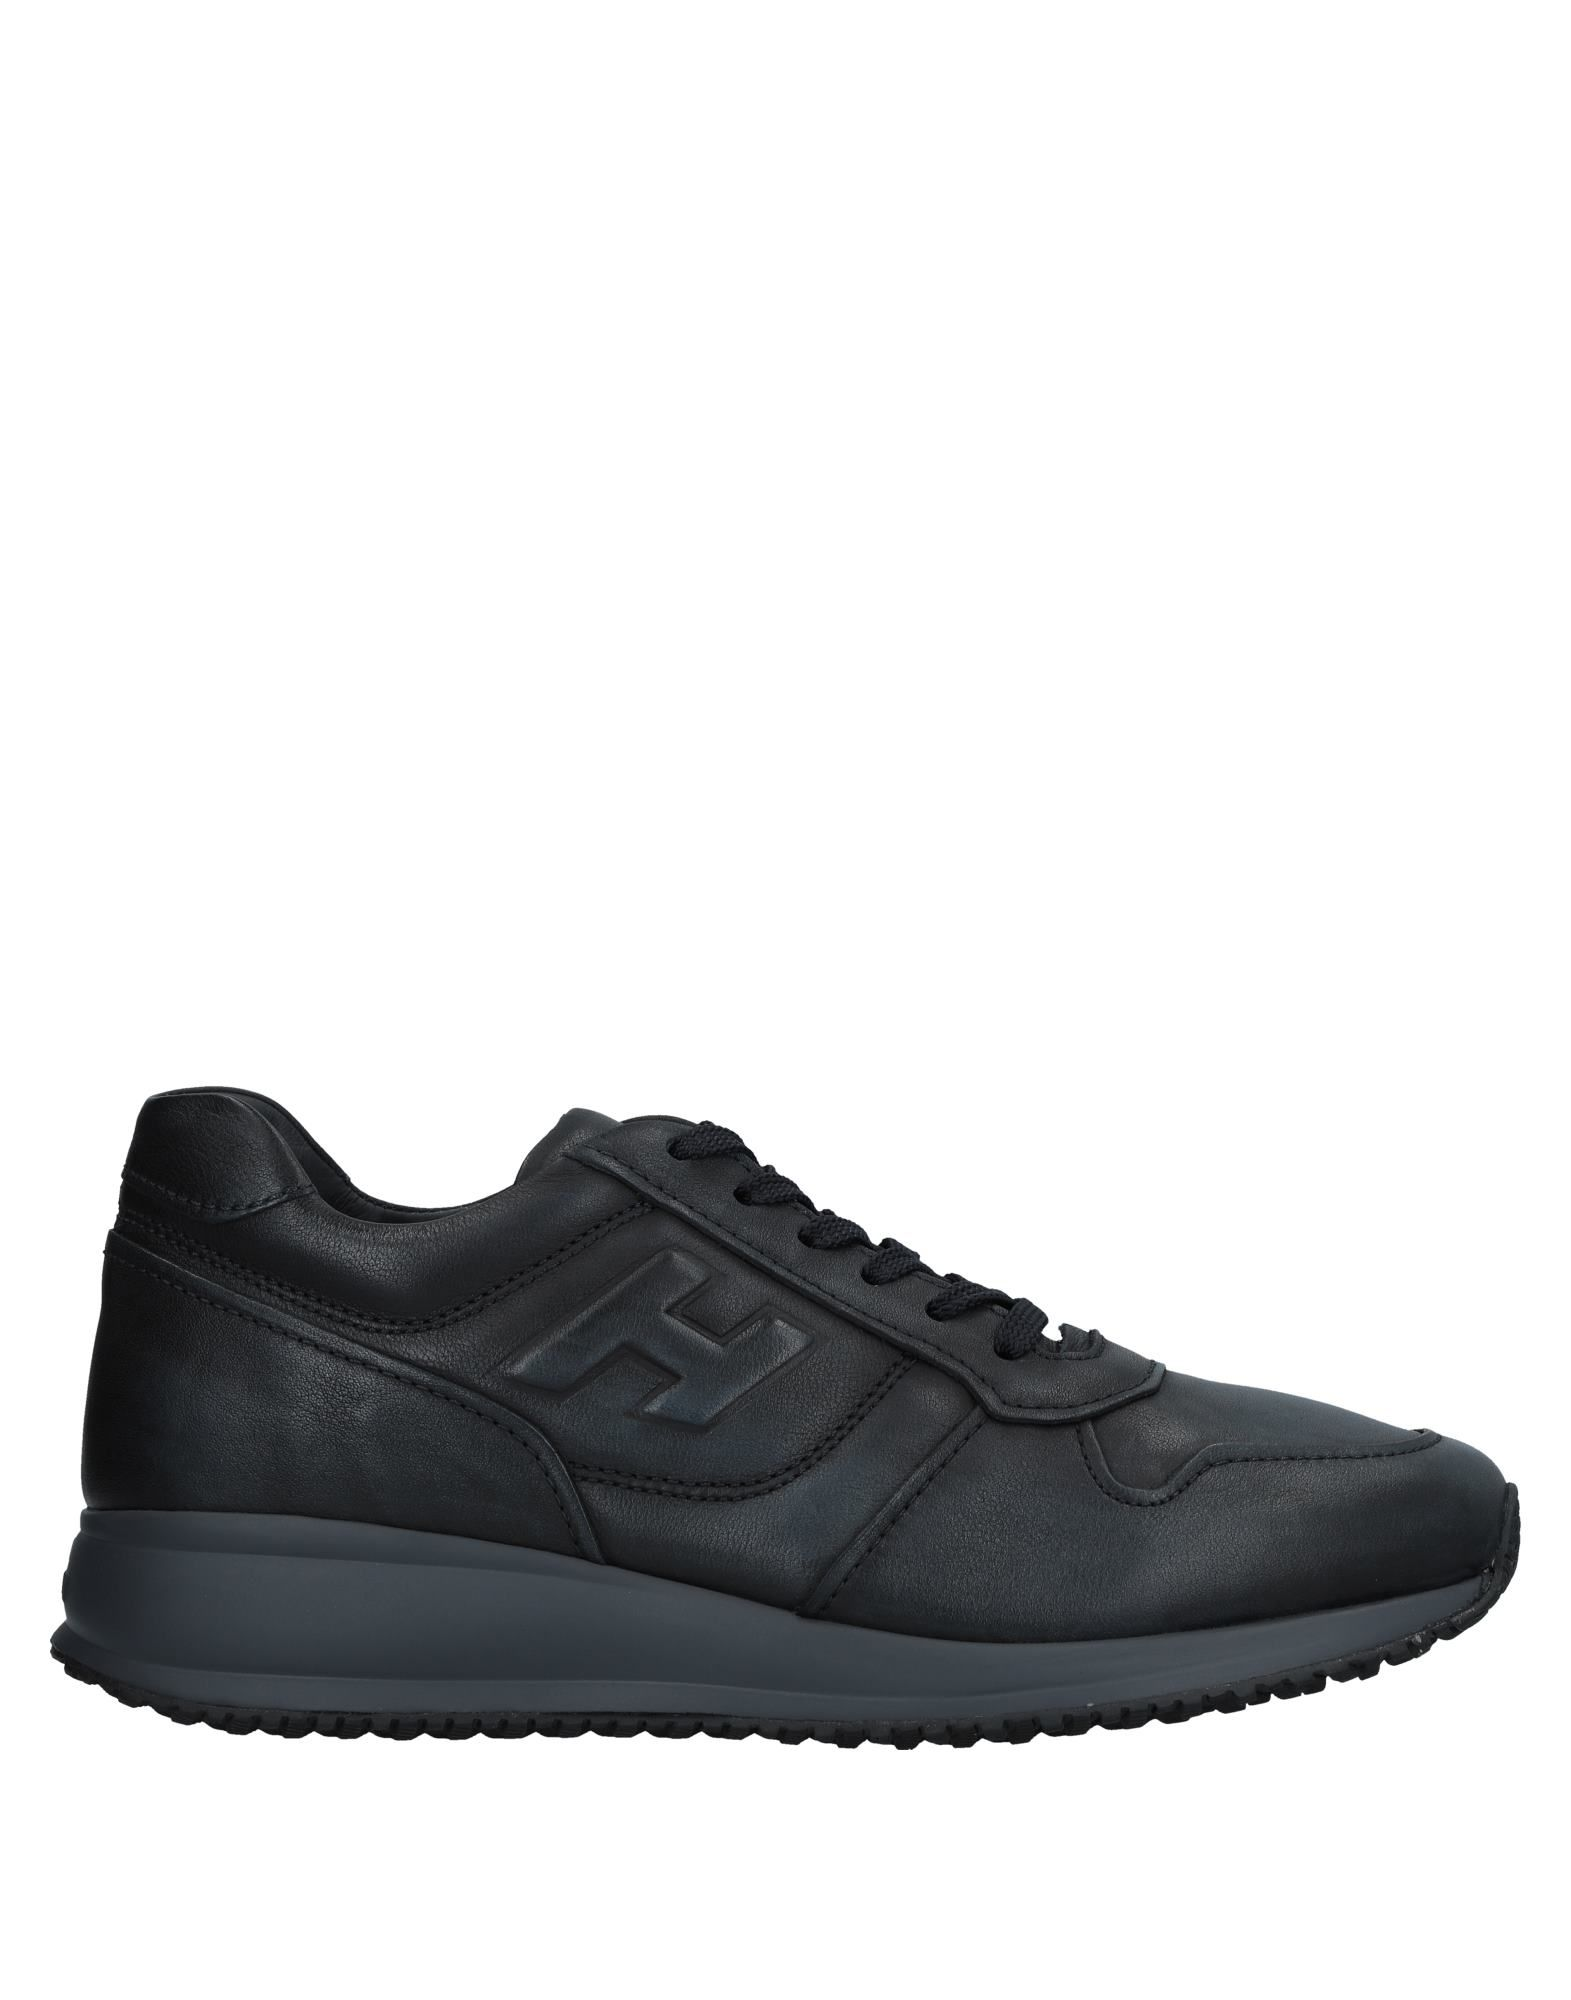 Sneakers Hogan Uomo - 11518483DG elegante